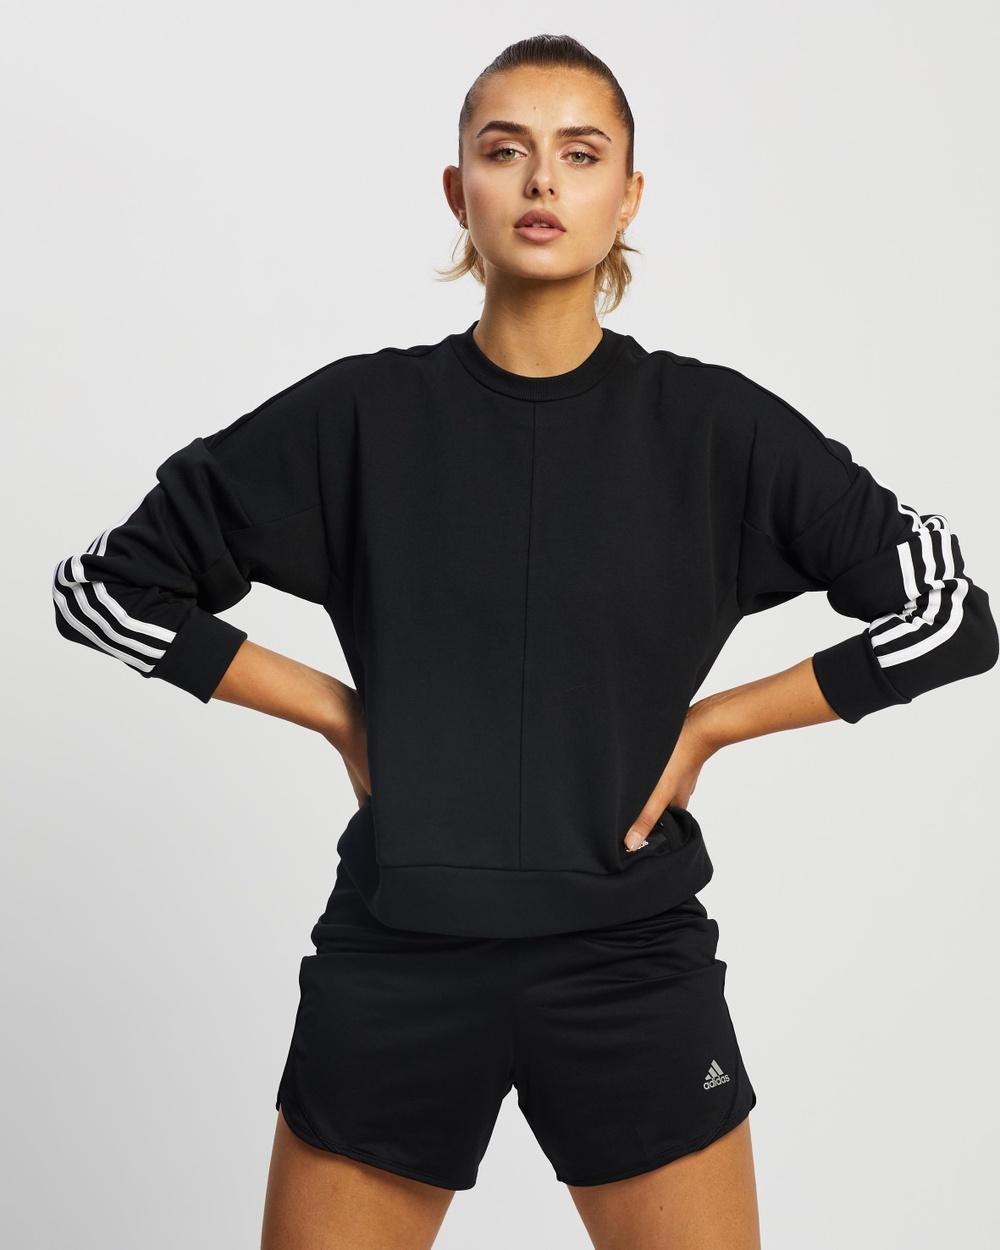 adidas Performance 3 Stripes Crew Sweatshirt Necks Black & White 3-Stripes